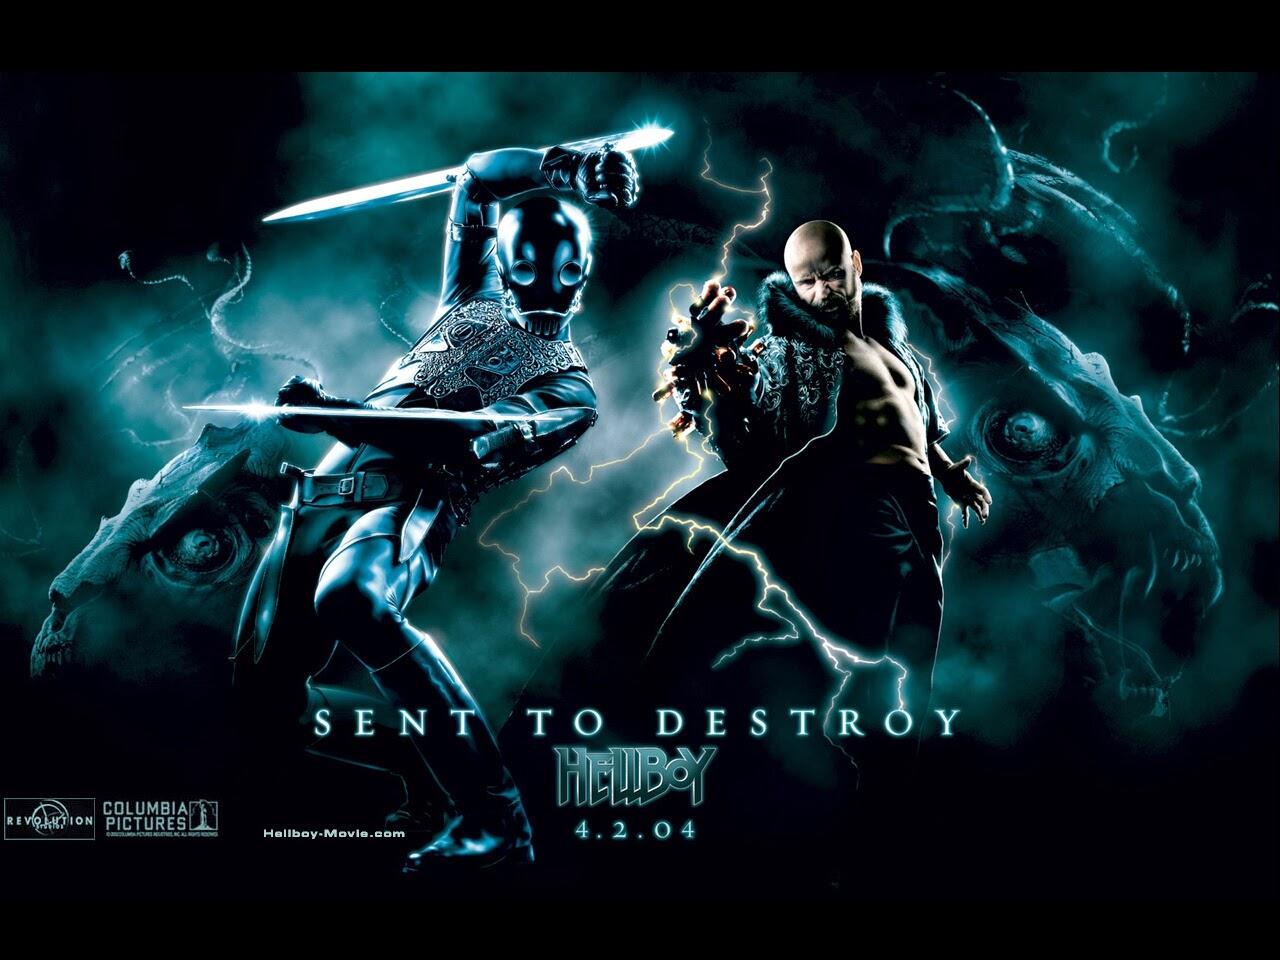 Hell-Boy (2004) English Full Movie *Blu-Ray* ~ IMoviez